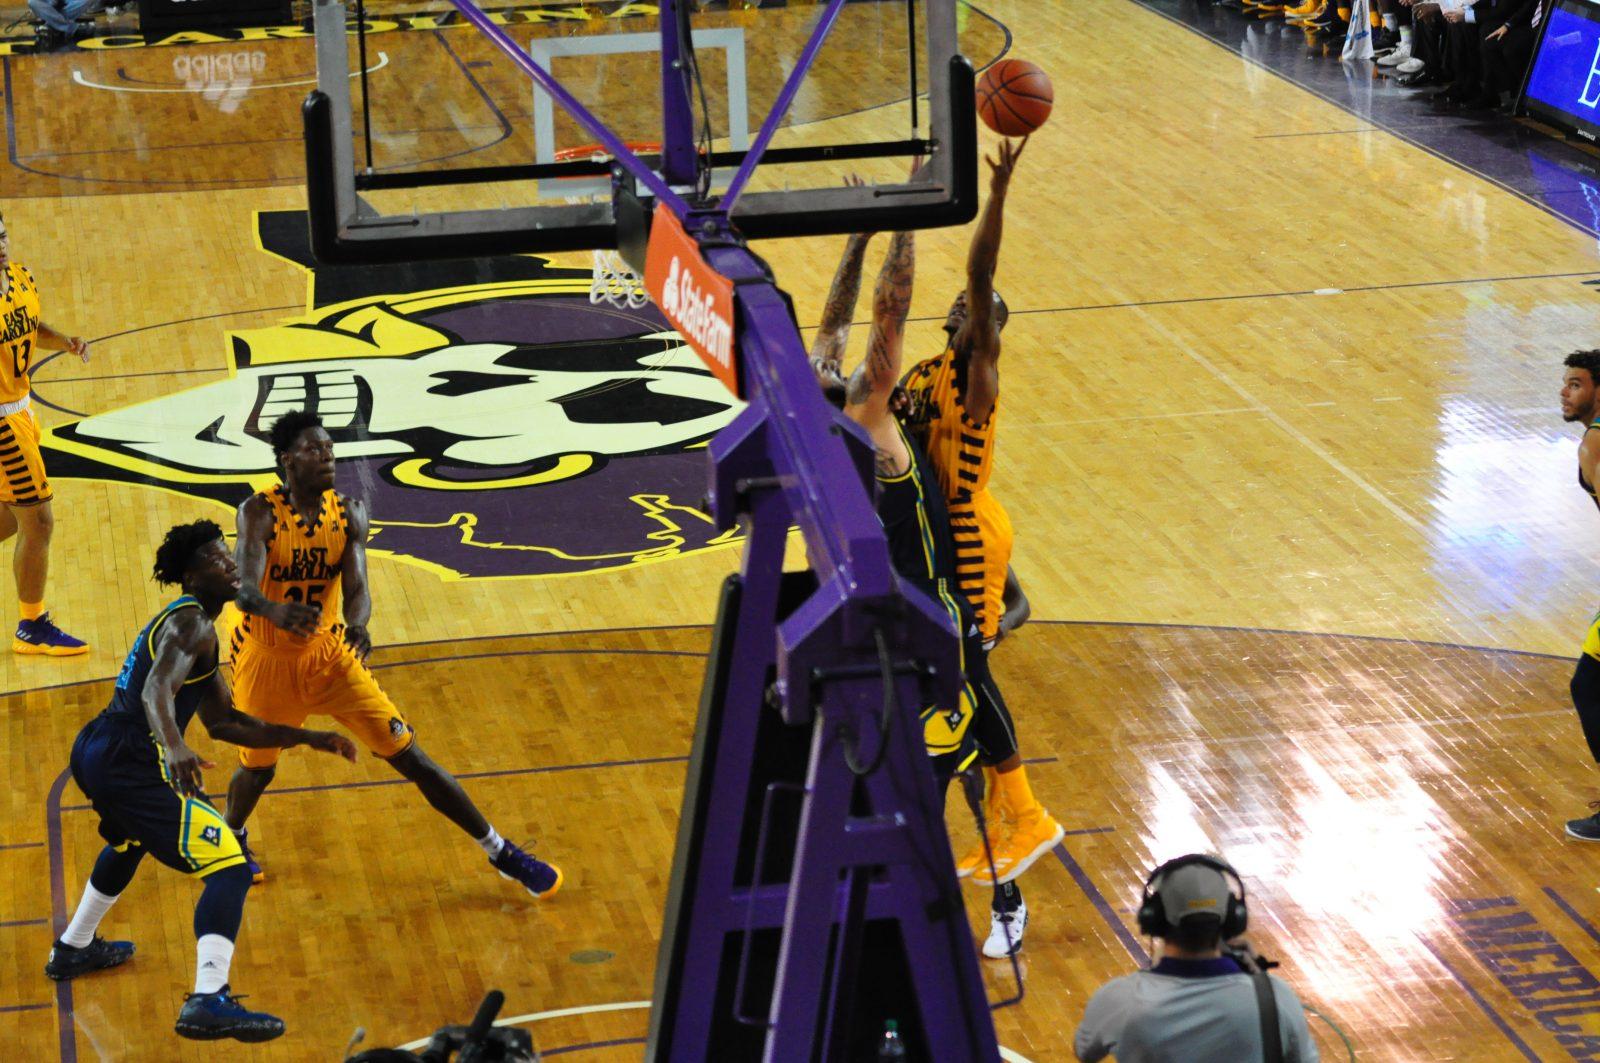 ECU senior B.J. Tyson drives to get a shot up in the paint. (Photo by Al Myatt)